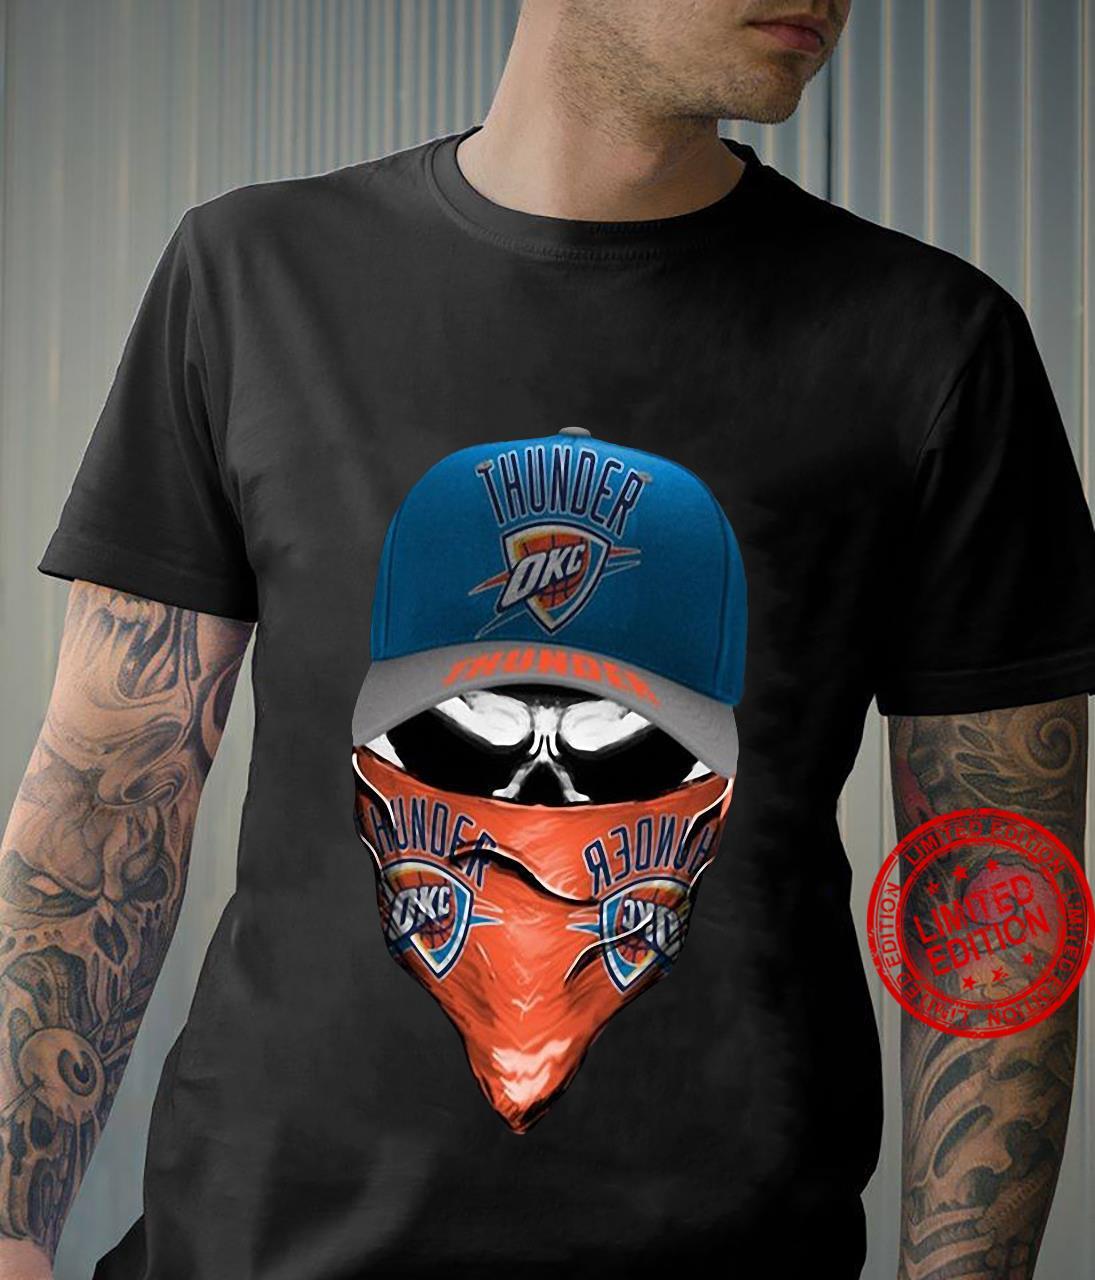 Thunder OKC Skull With Face Mask Shirt